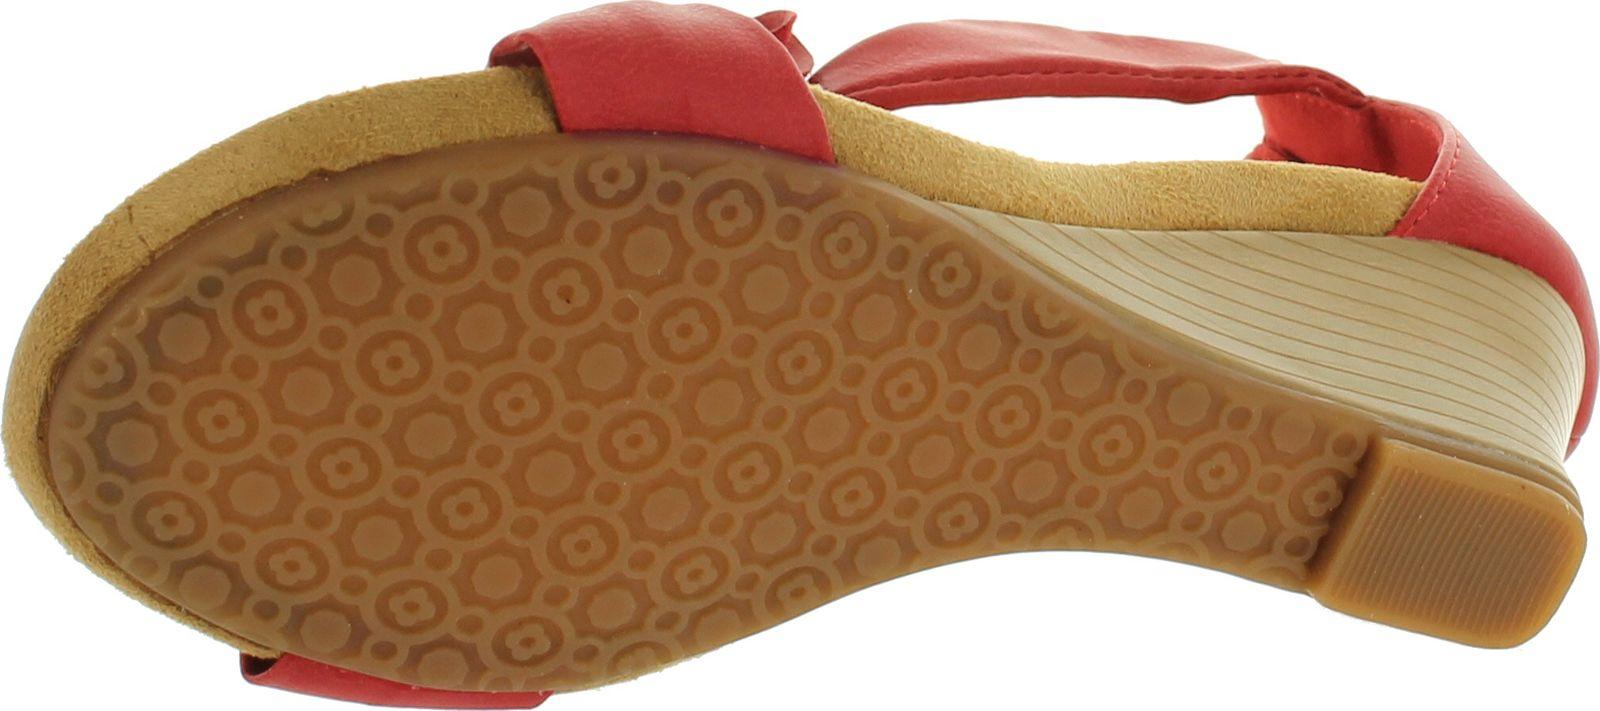 thumbnail 16 - PATRIZIA by Spring Step Womens Harlequin Fashion Wedge Sandals